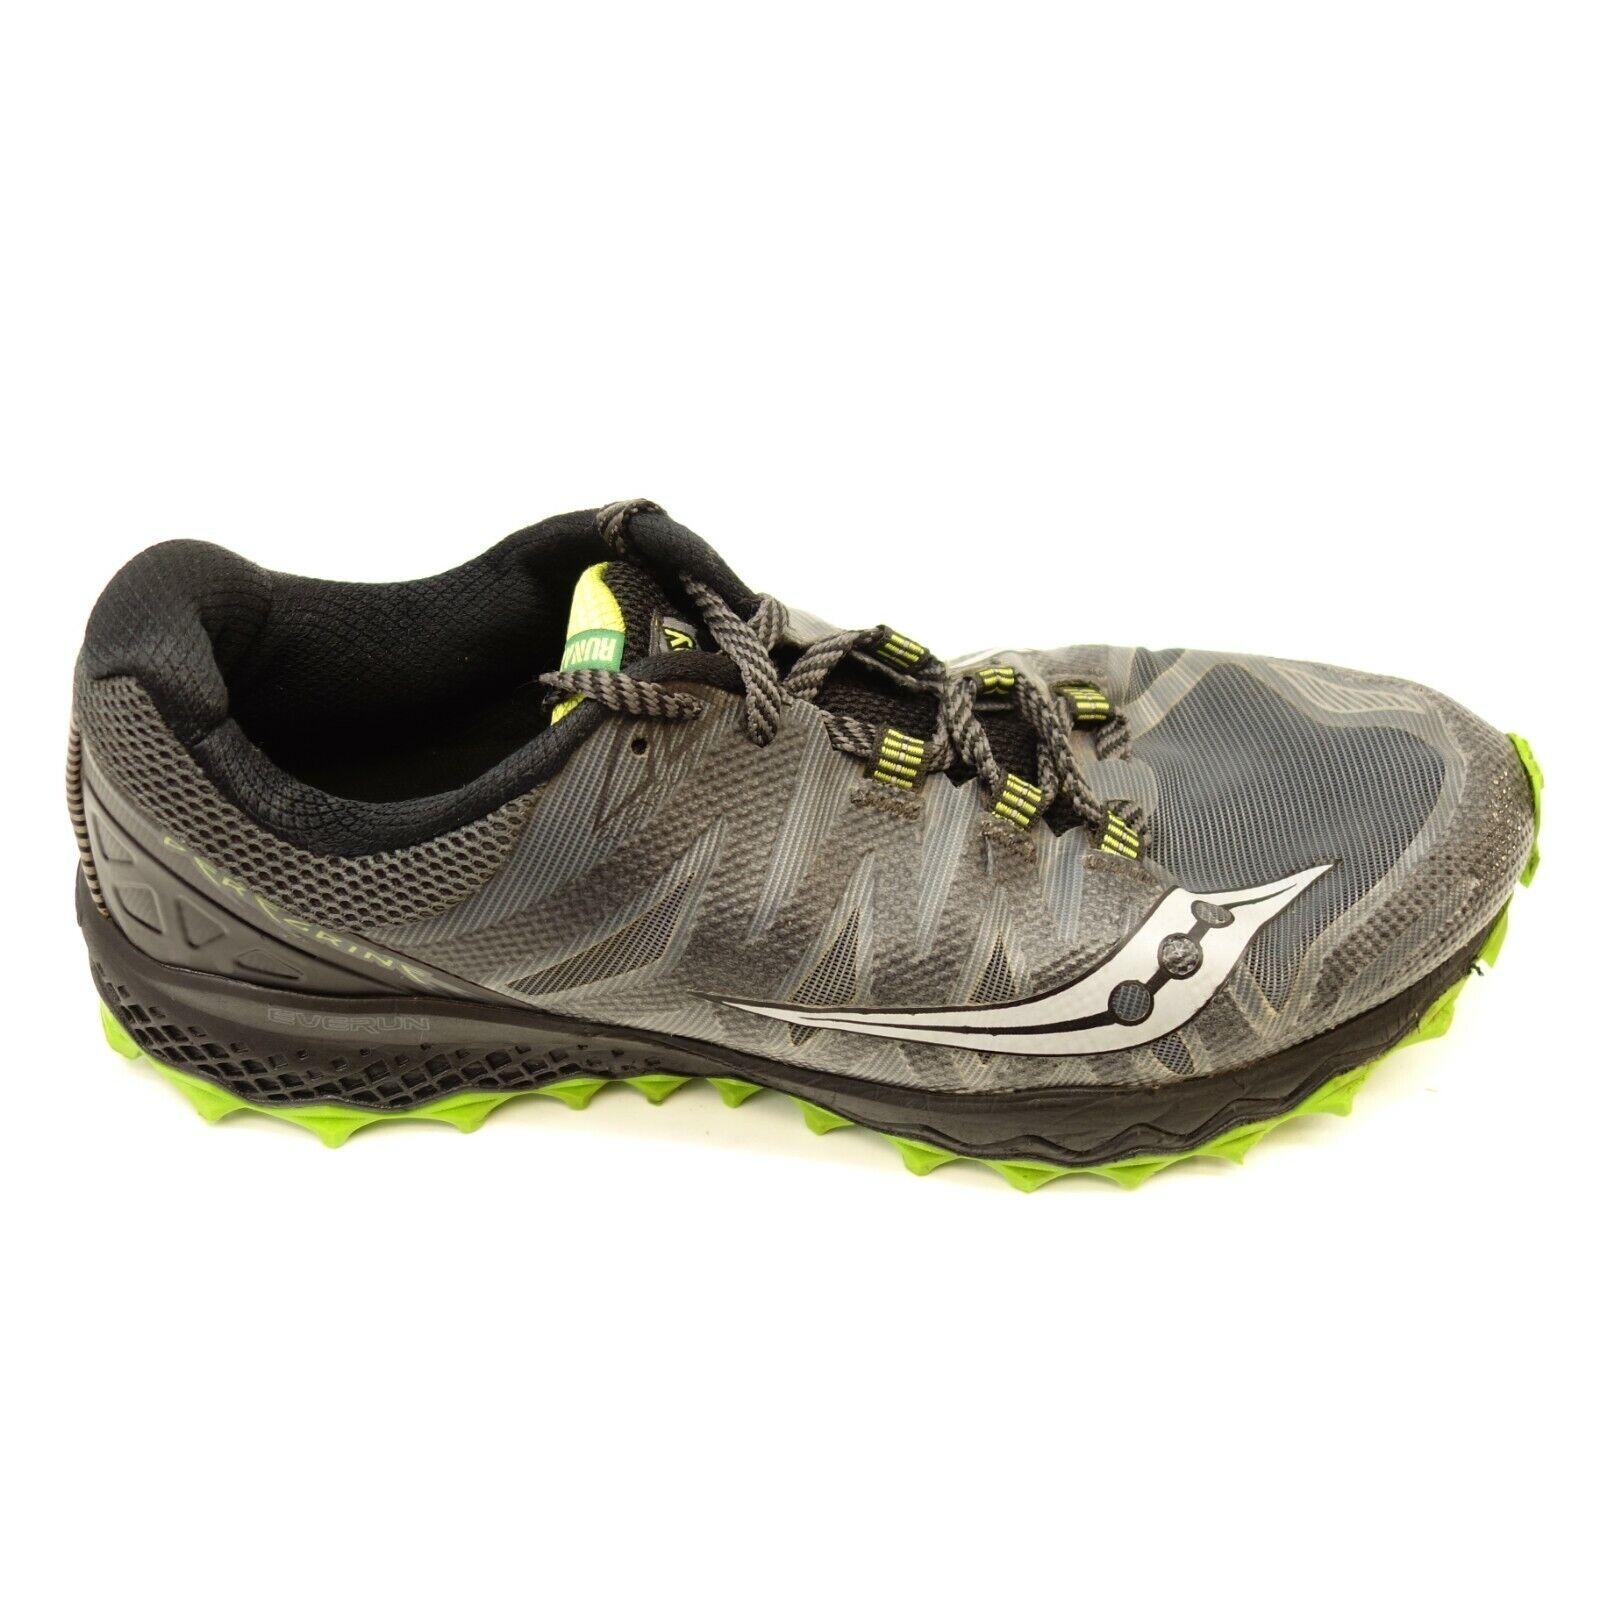 Saucony Mens Size 11 Peregrine Everun Athletic Comfort Terrain Running shoes